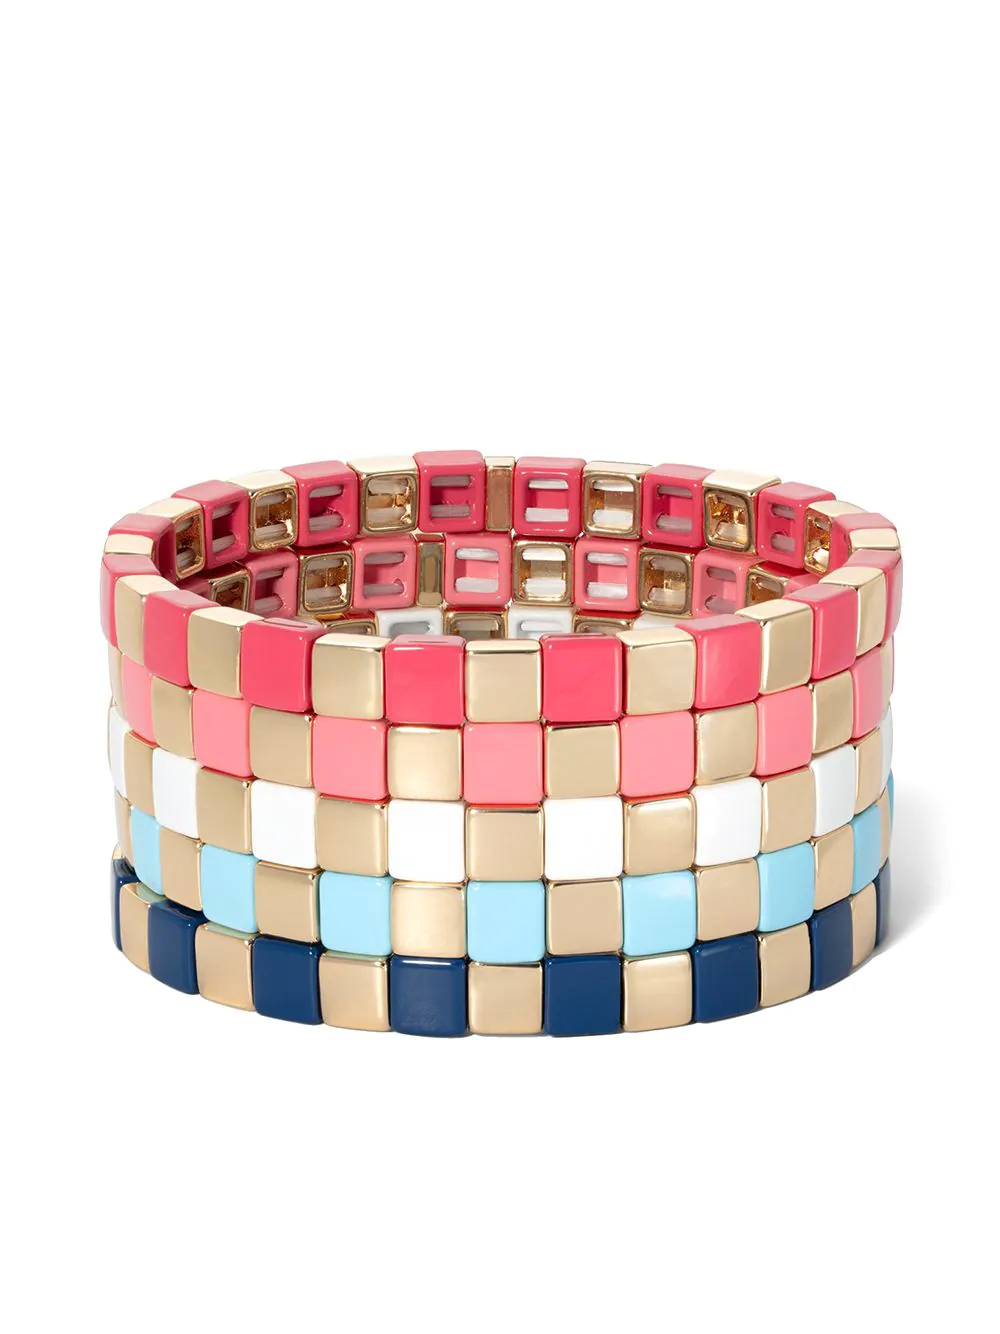 Roxanne Assoulin Gilded Checkerboard Bracelet 1405лв